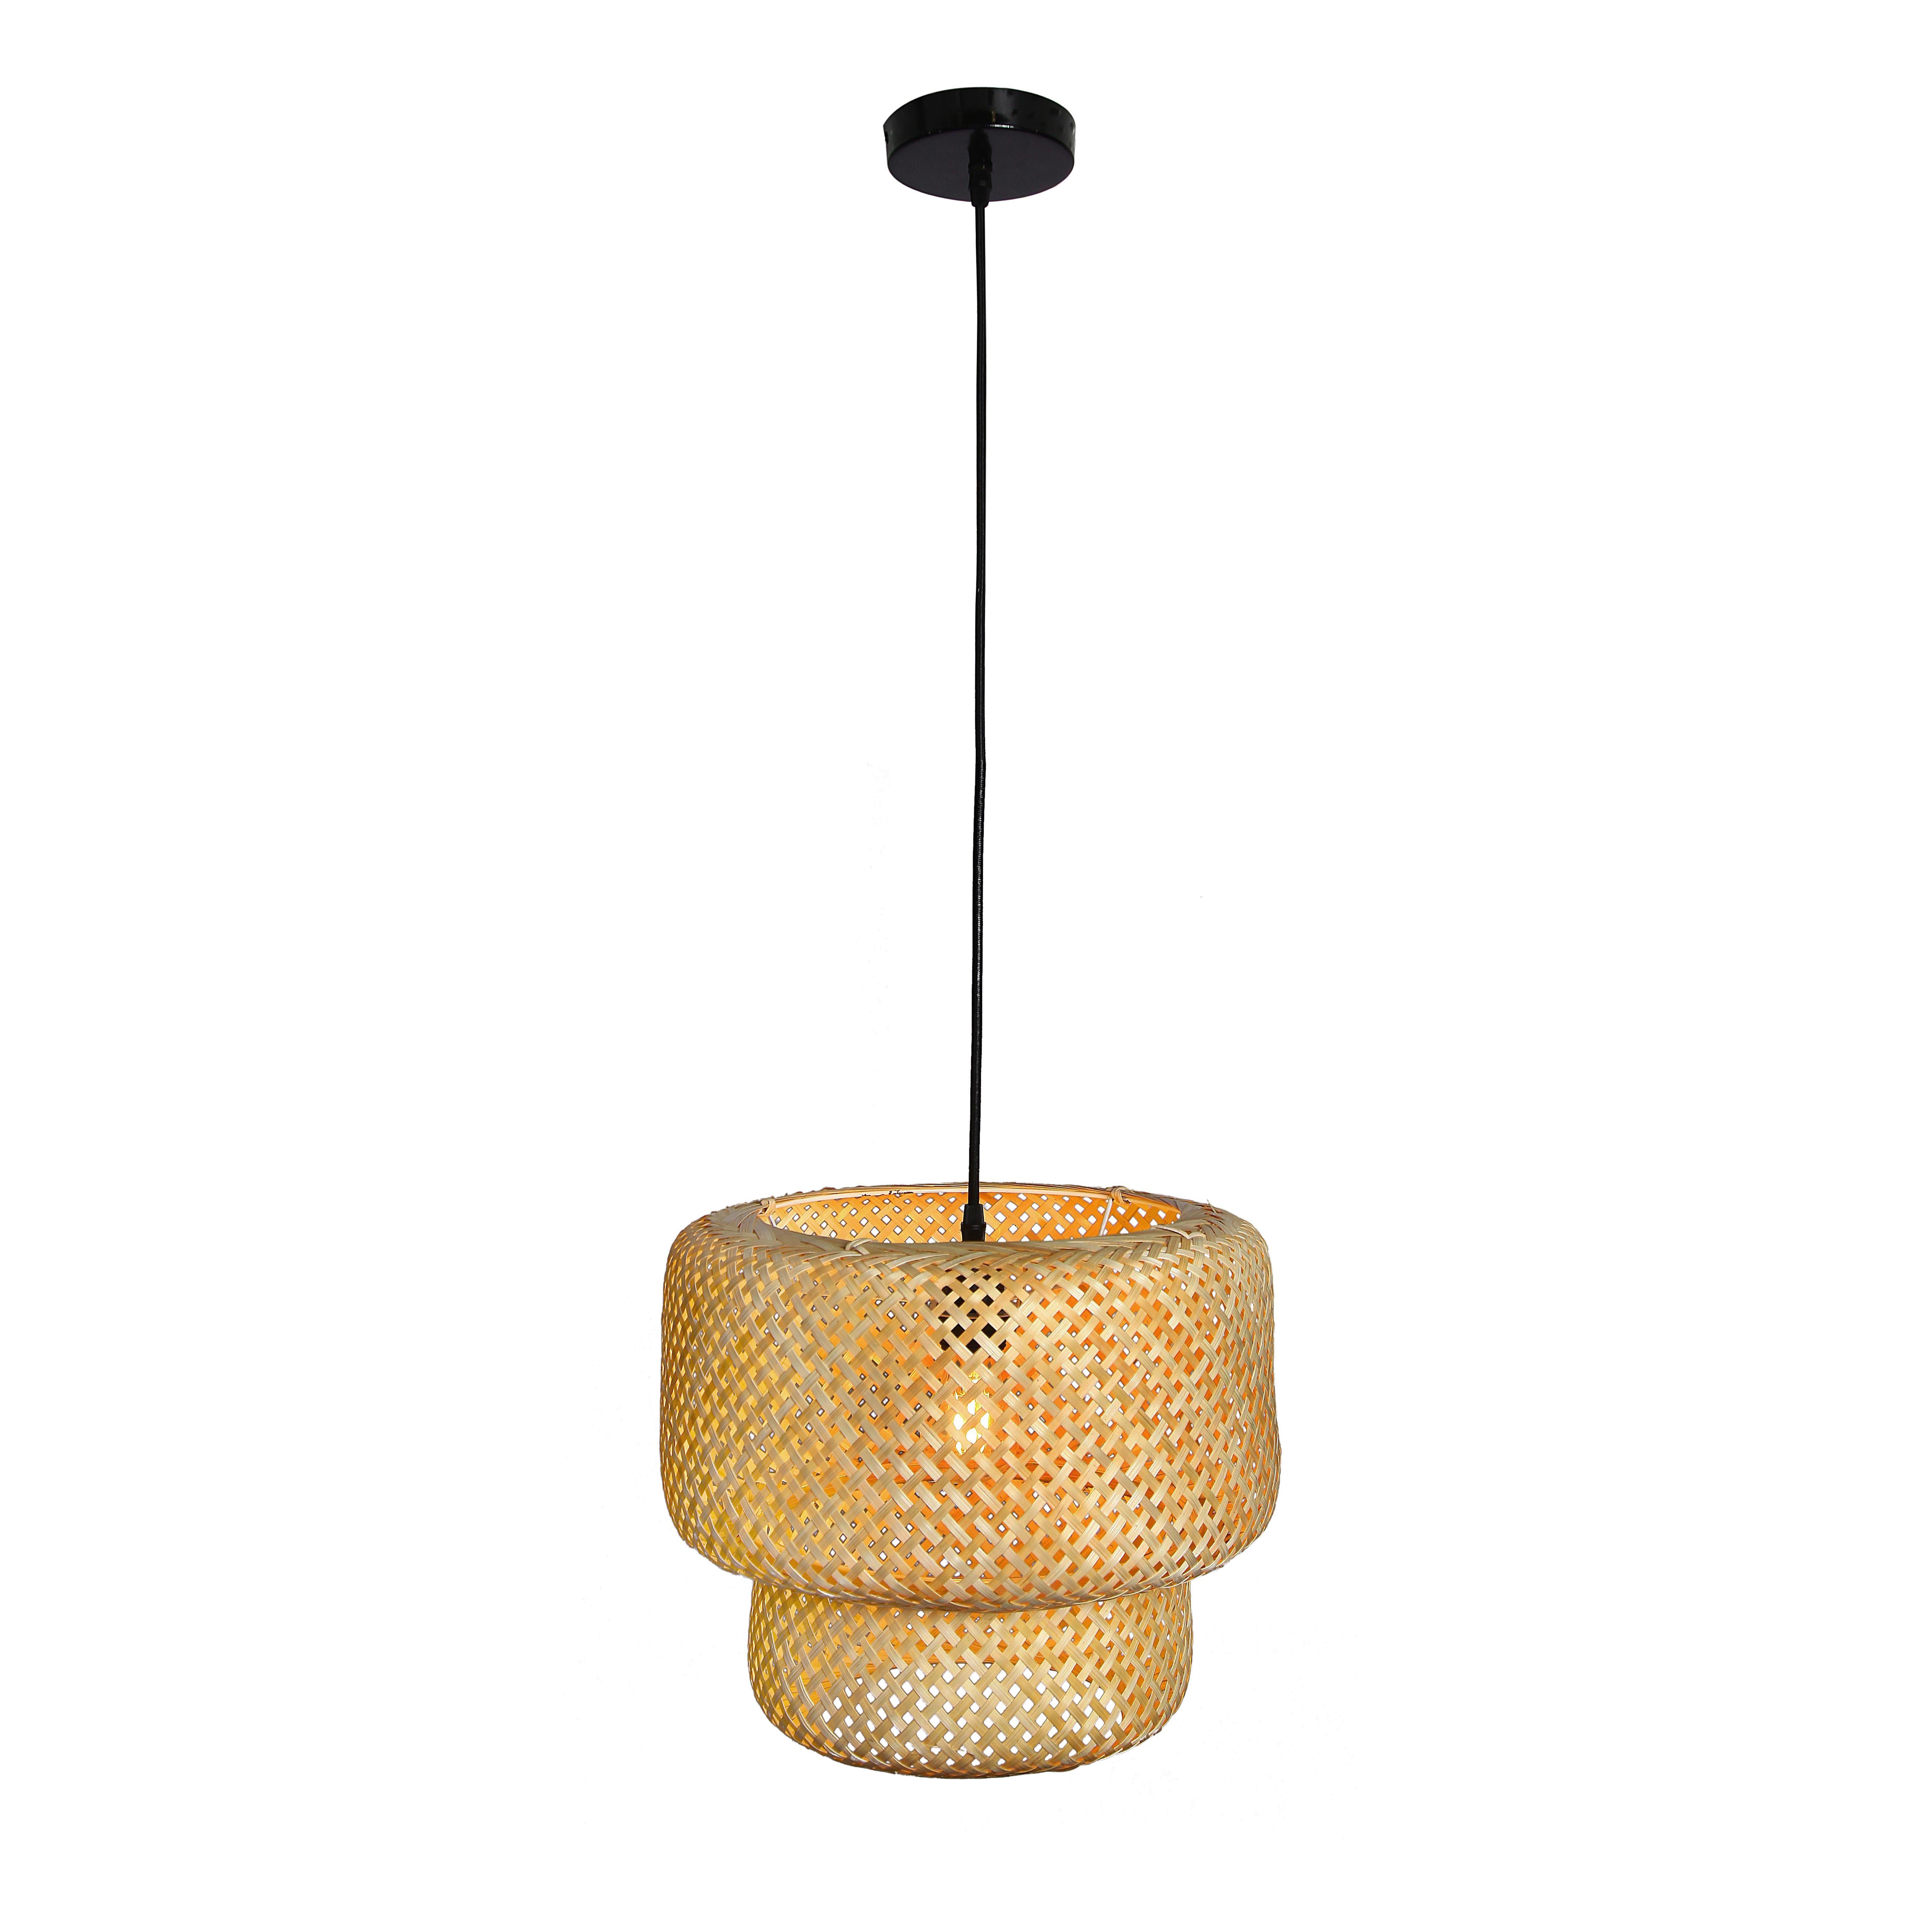 Lampen | Design Leuchten jetzt bei bestellen